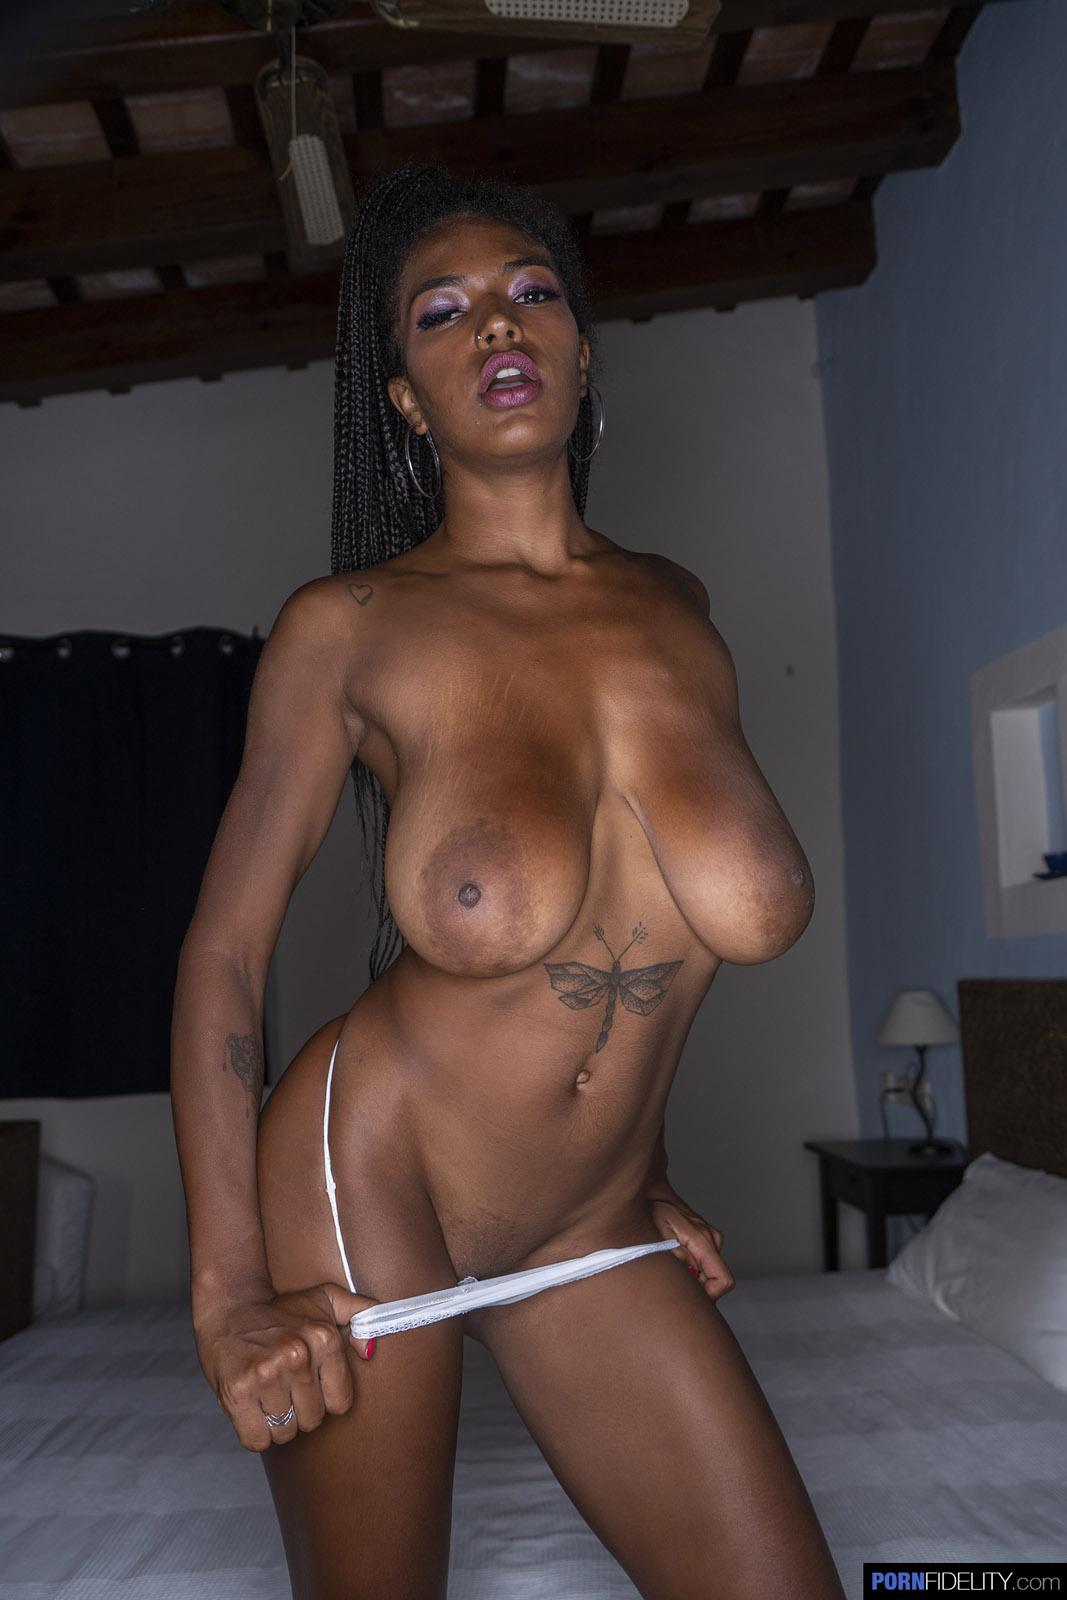 https://cdn.curvyerotic.com/wp-content/uploads/2020/09/tina-fire-shes-on-fire-pornfidelity-6.jpg